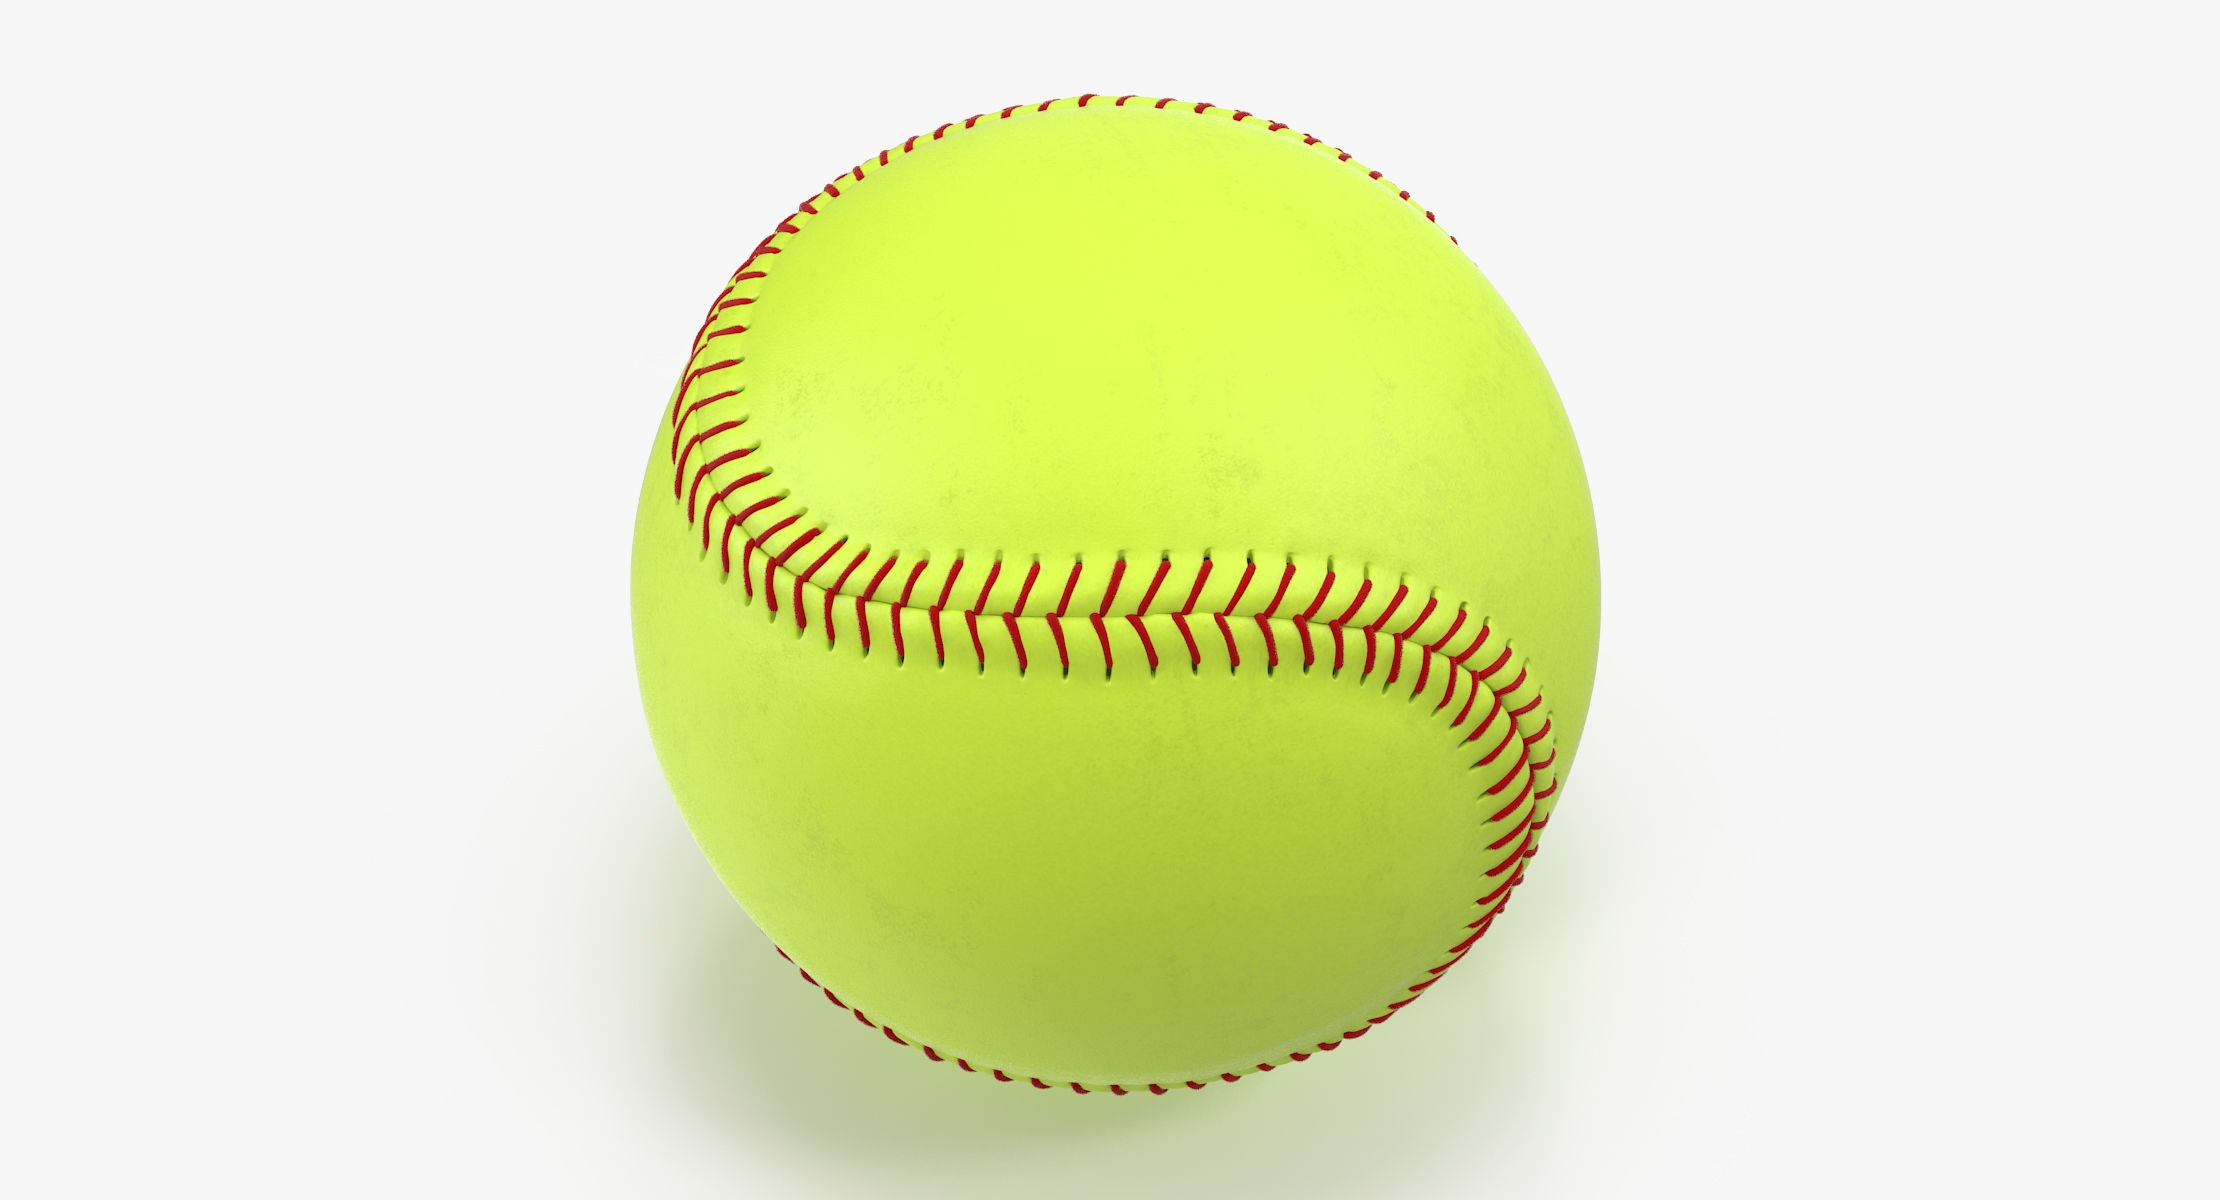 Softball - reel 1